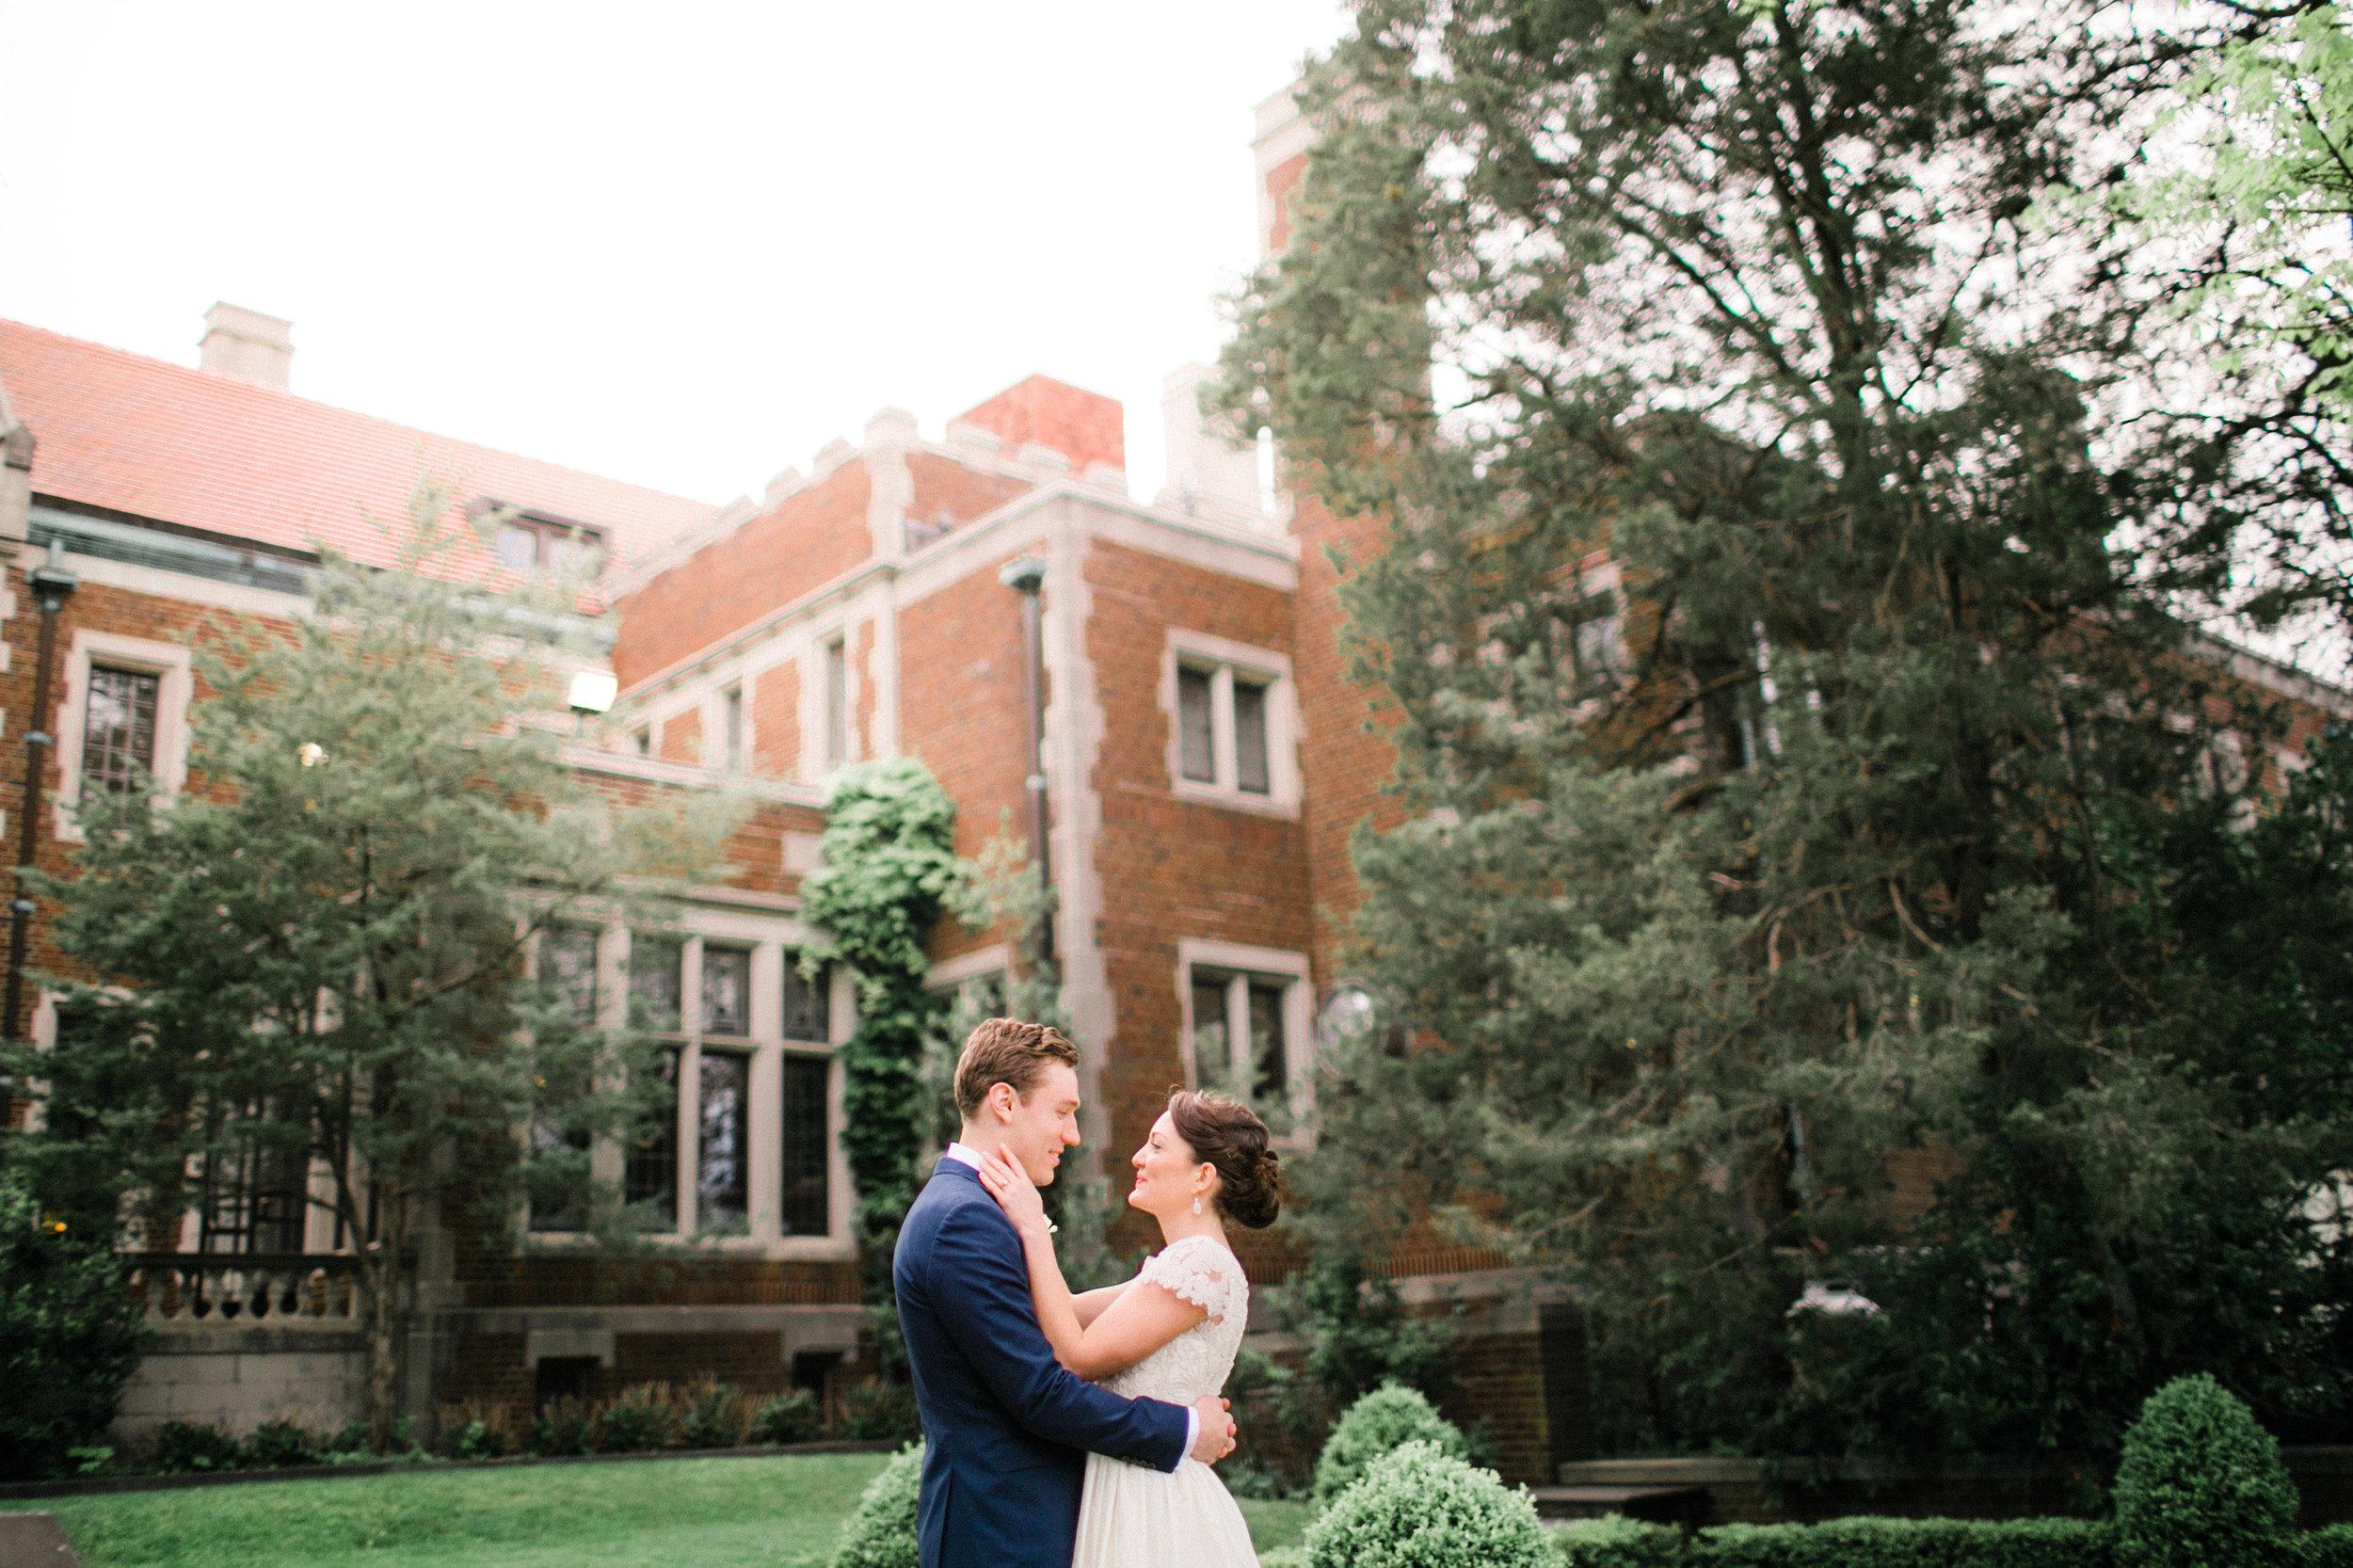 mayden photography weddings-141.jpg